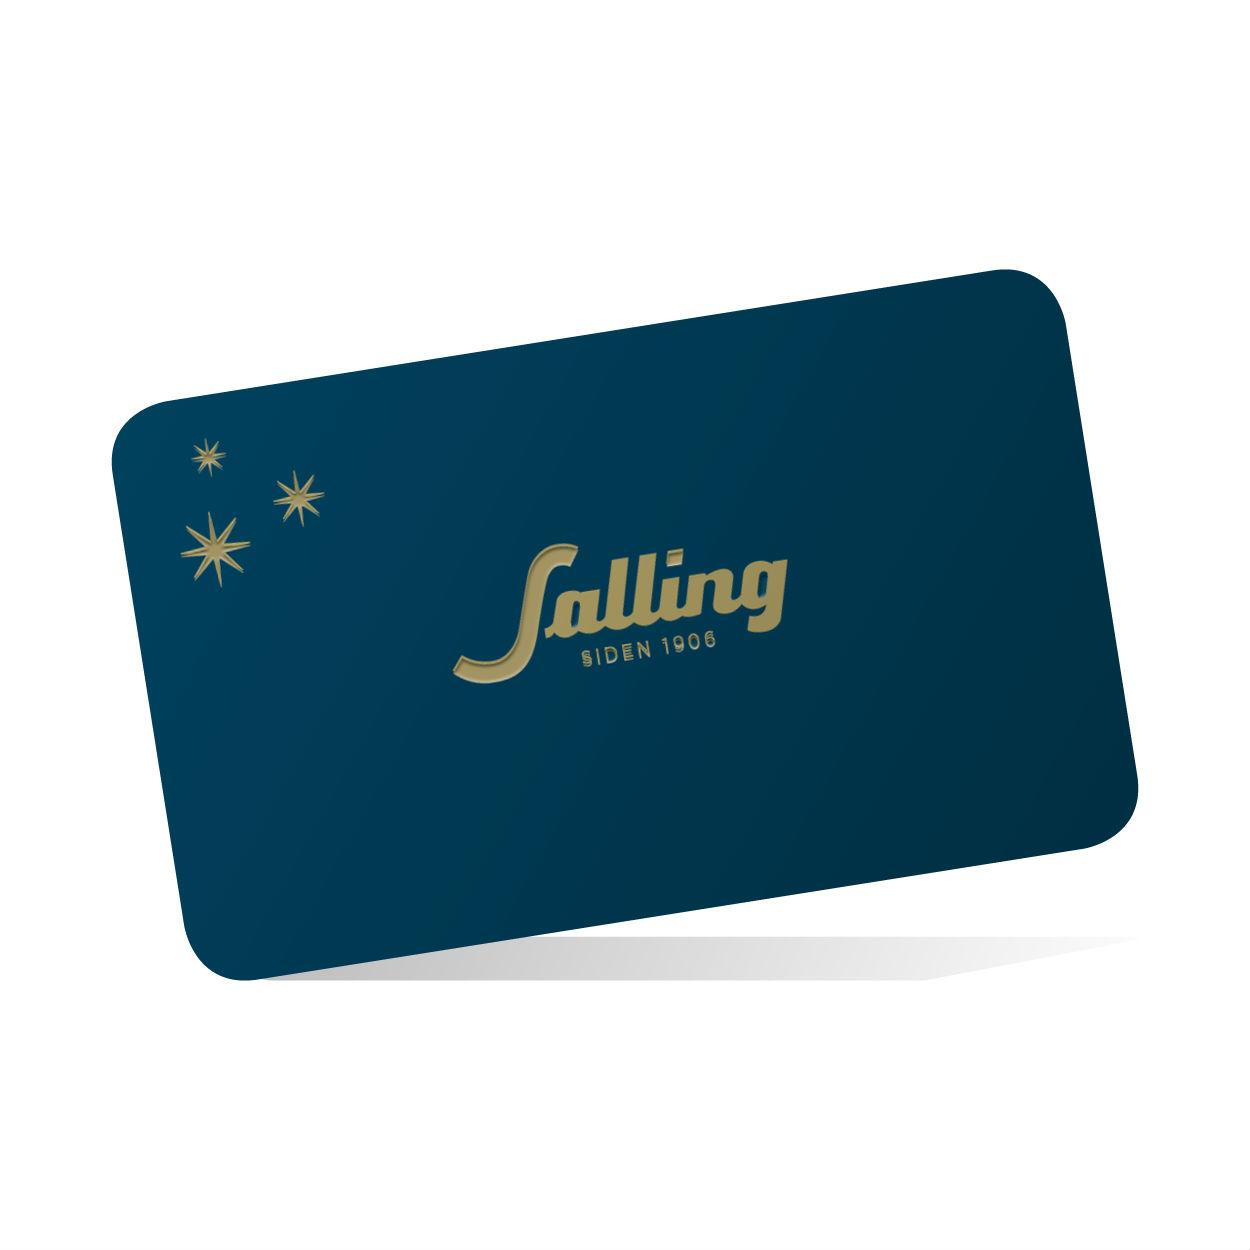 Salling gavekort - 400 kr